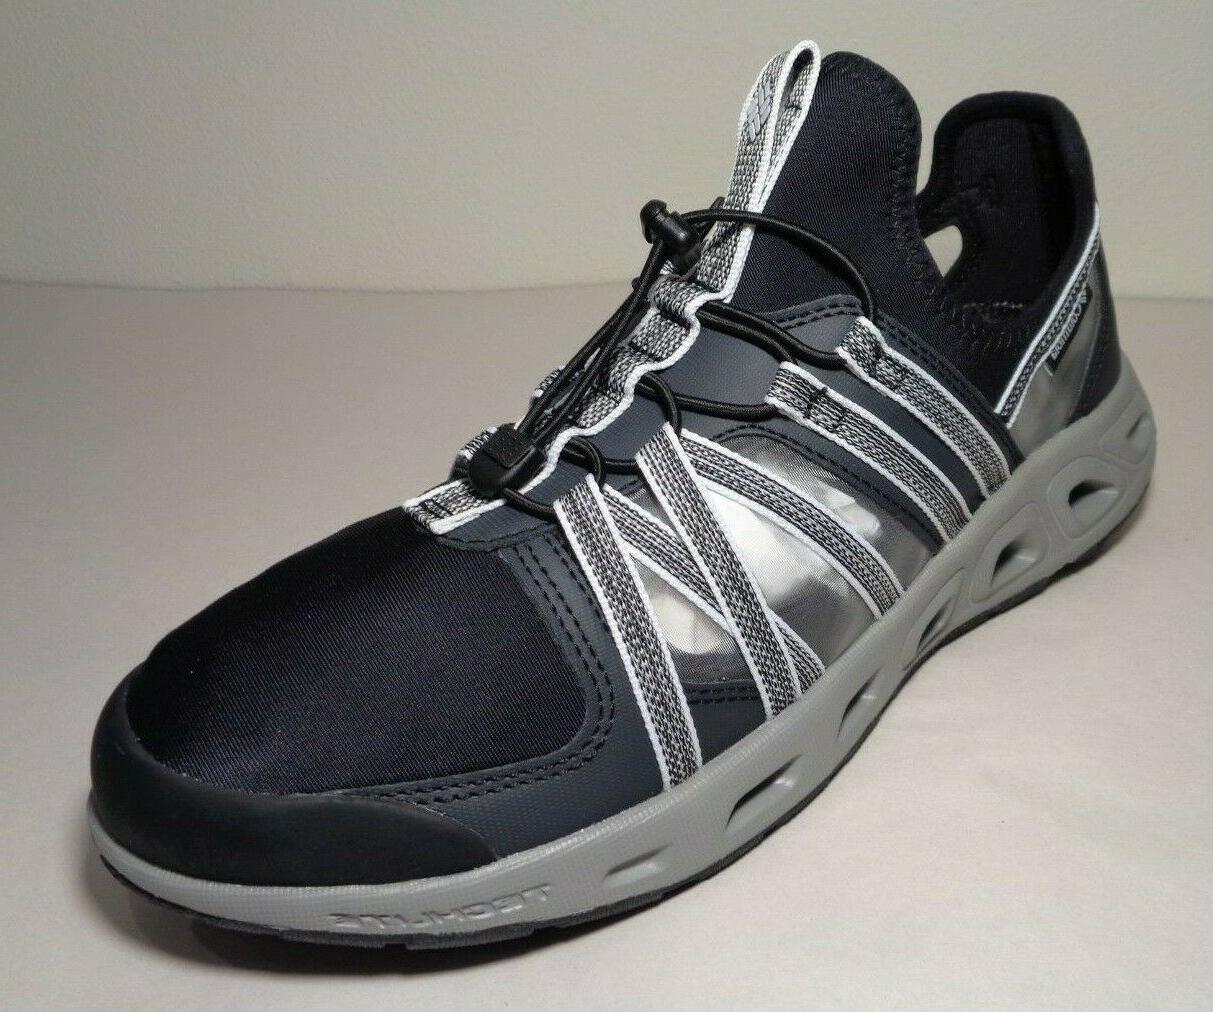 Columbia OKOLONA White Sneakers New Shoes